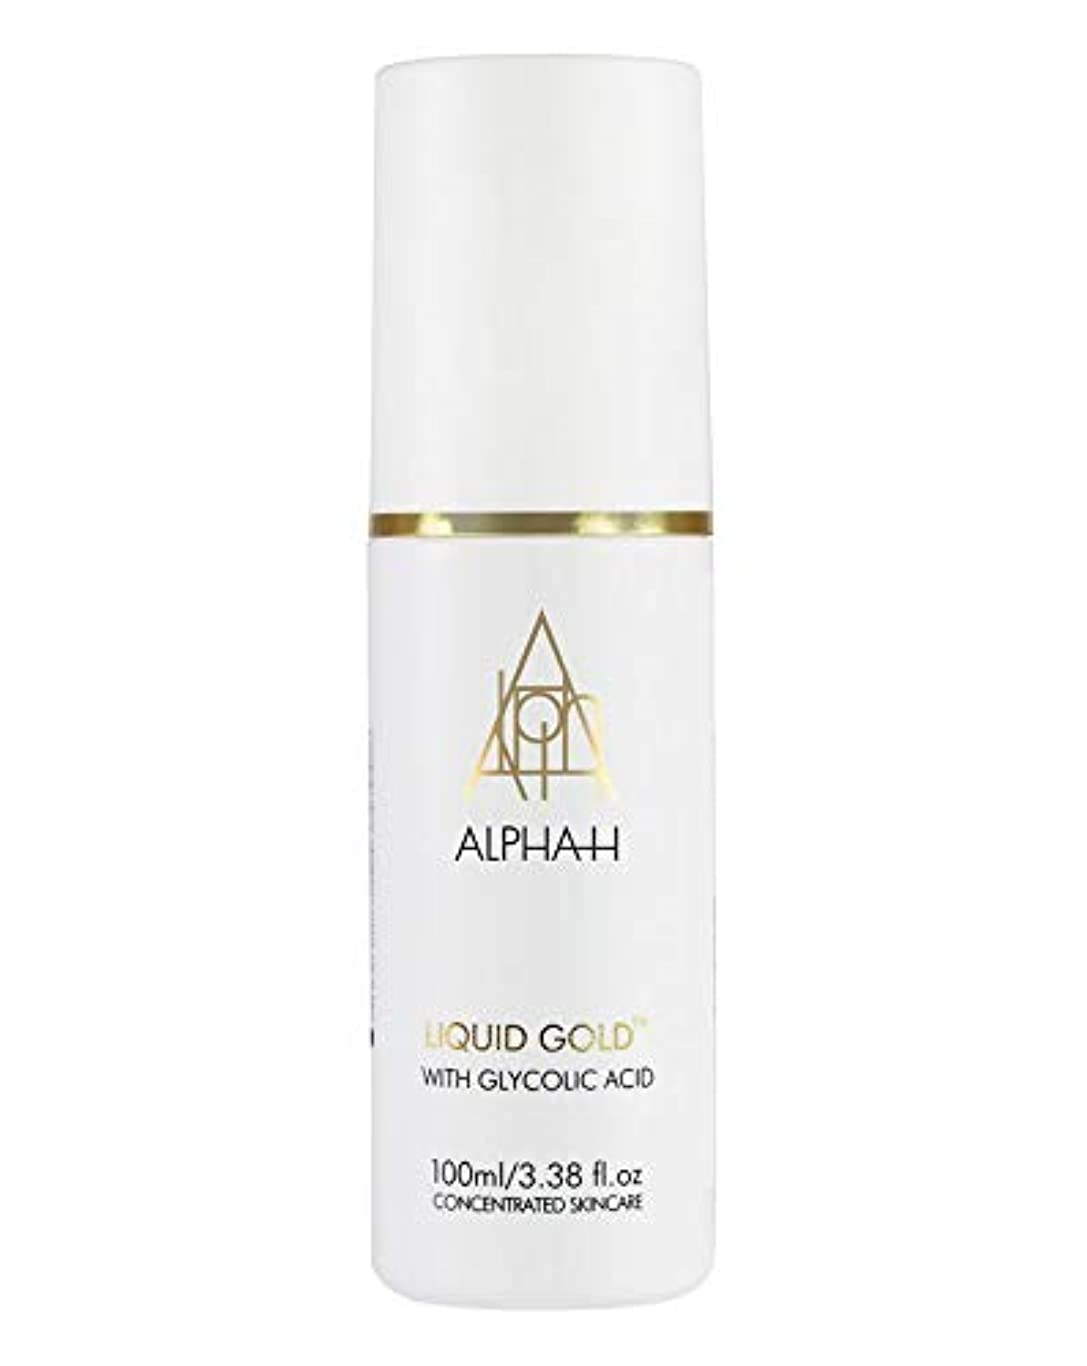 ALPHA-H LIQUID GOLD アルファ H リキッドゴールド 3.38 oz/ 100 mL [並行輸入品]